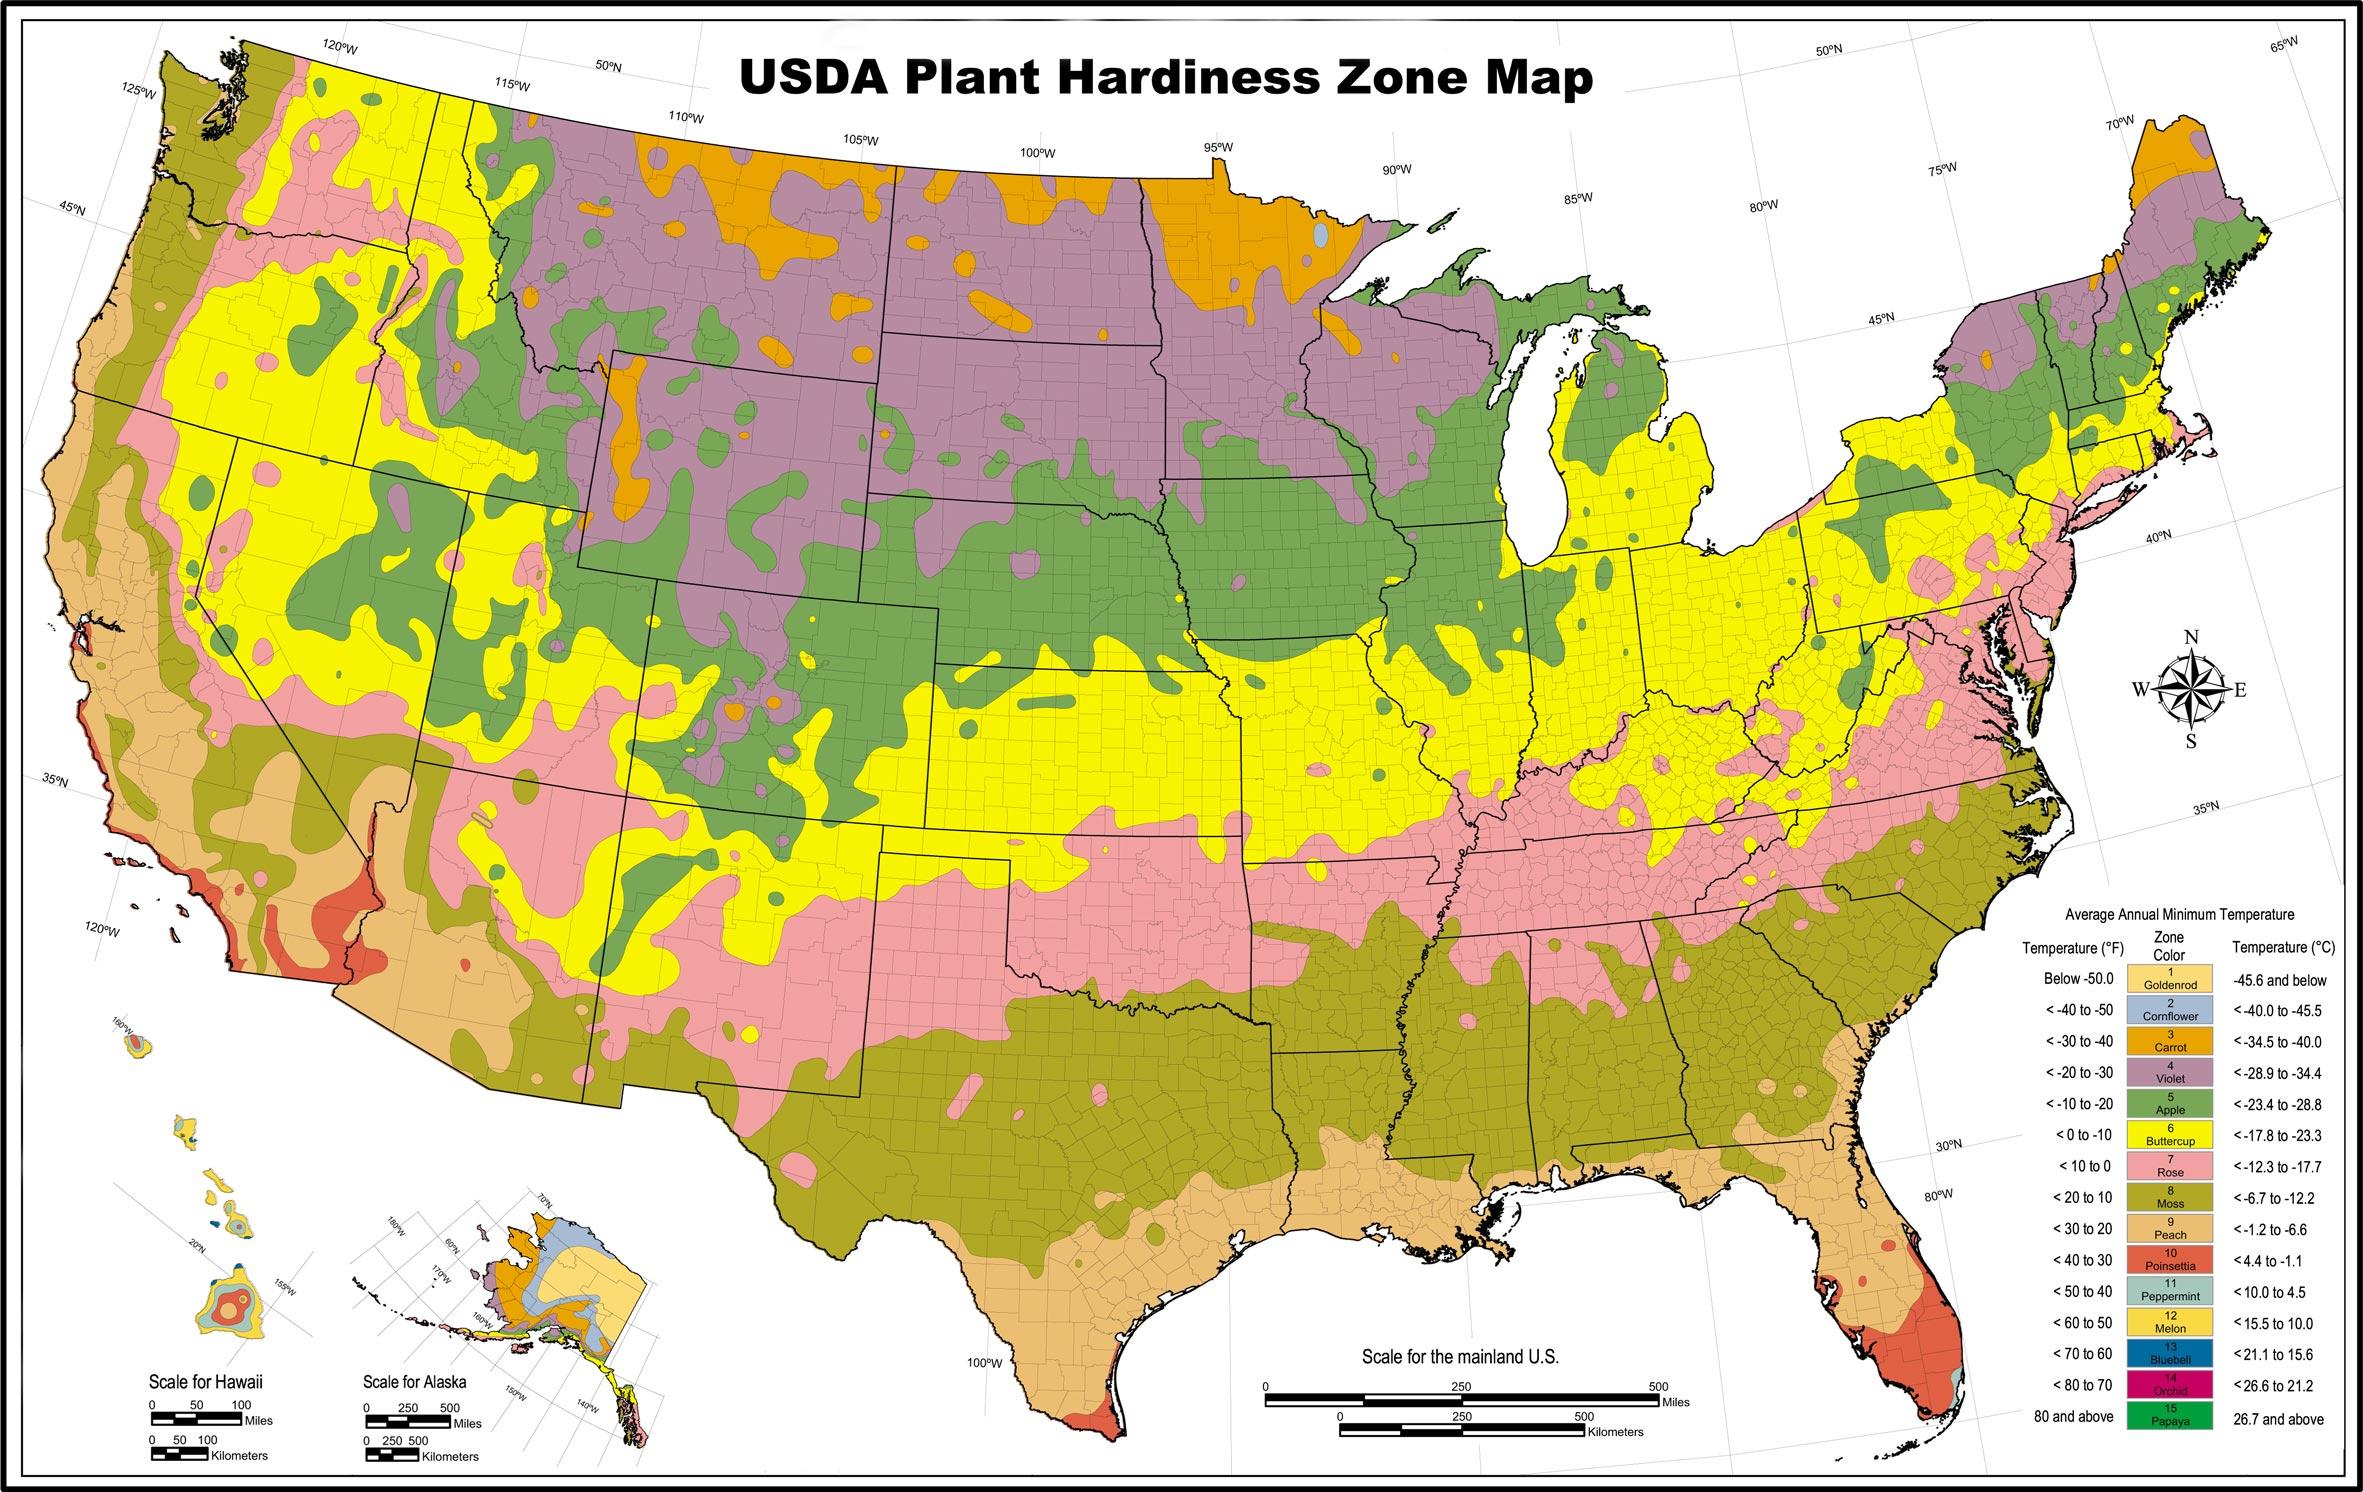 California Climate Zones Map - Klipy - California Heat Zone Map